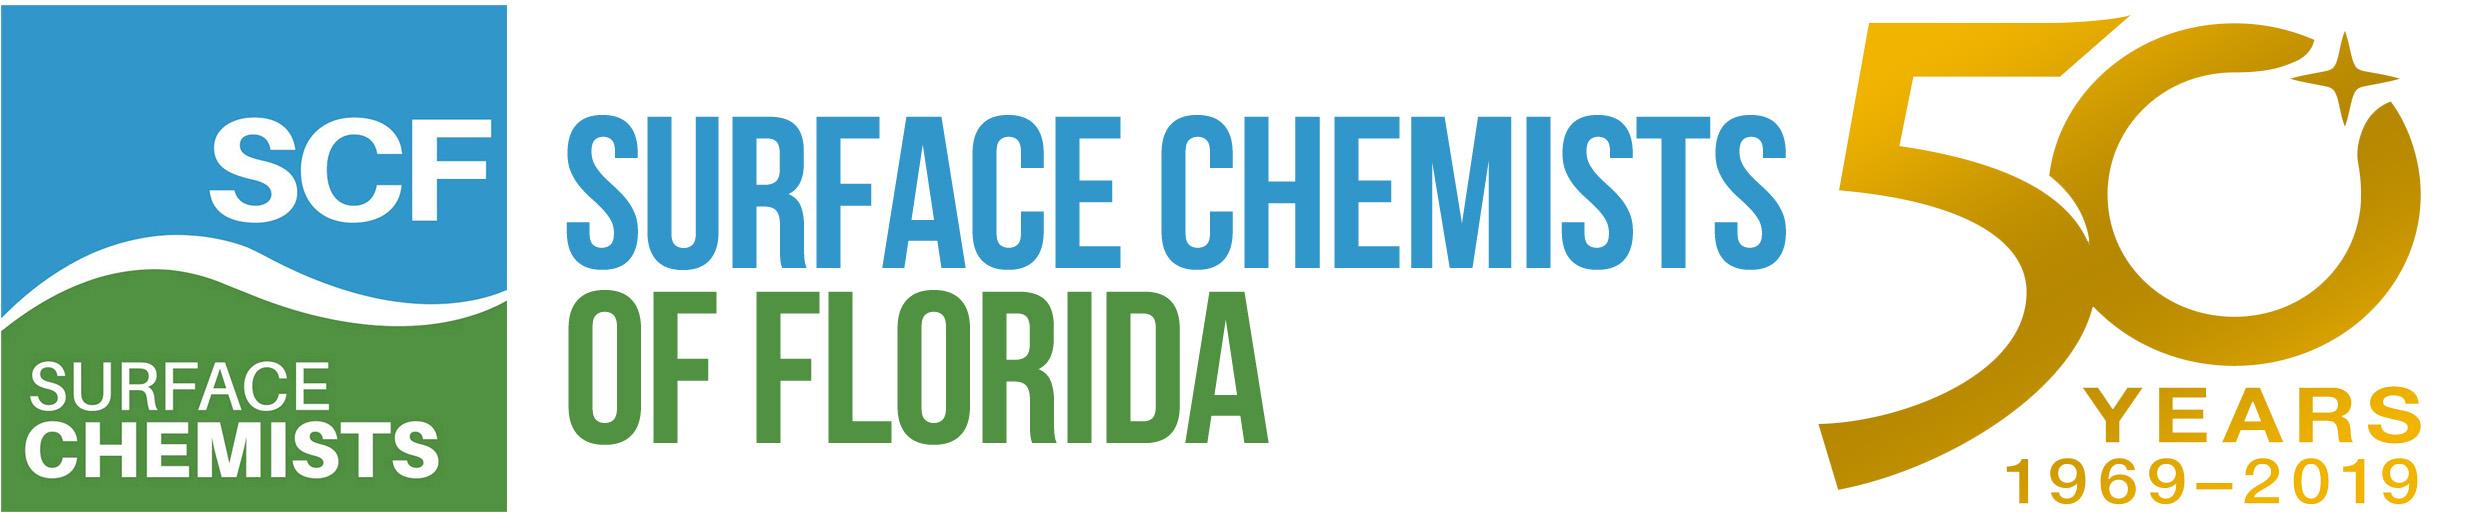 Surface Chemists of Florida